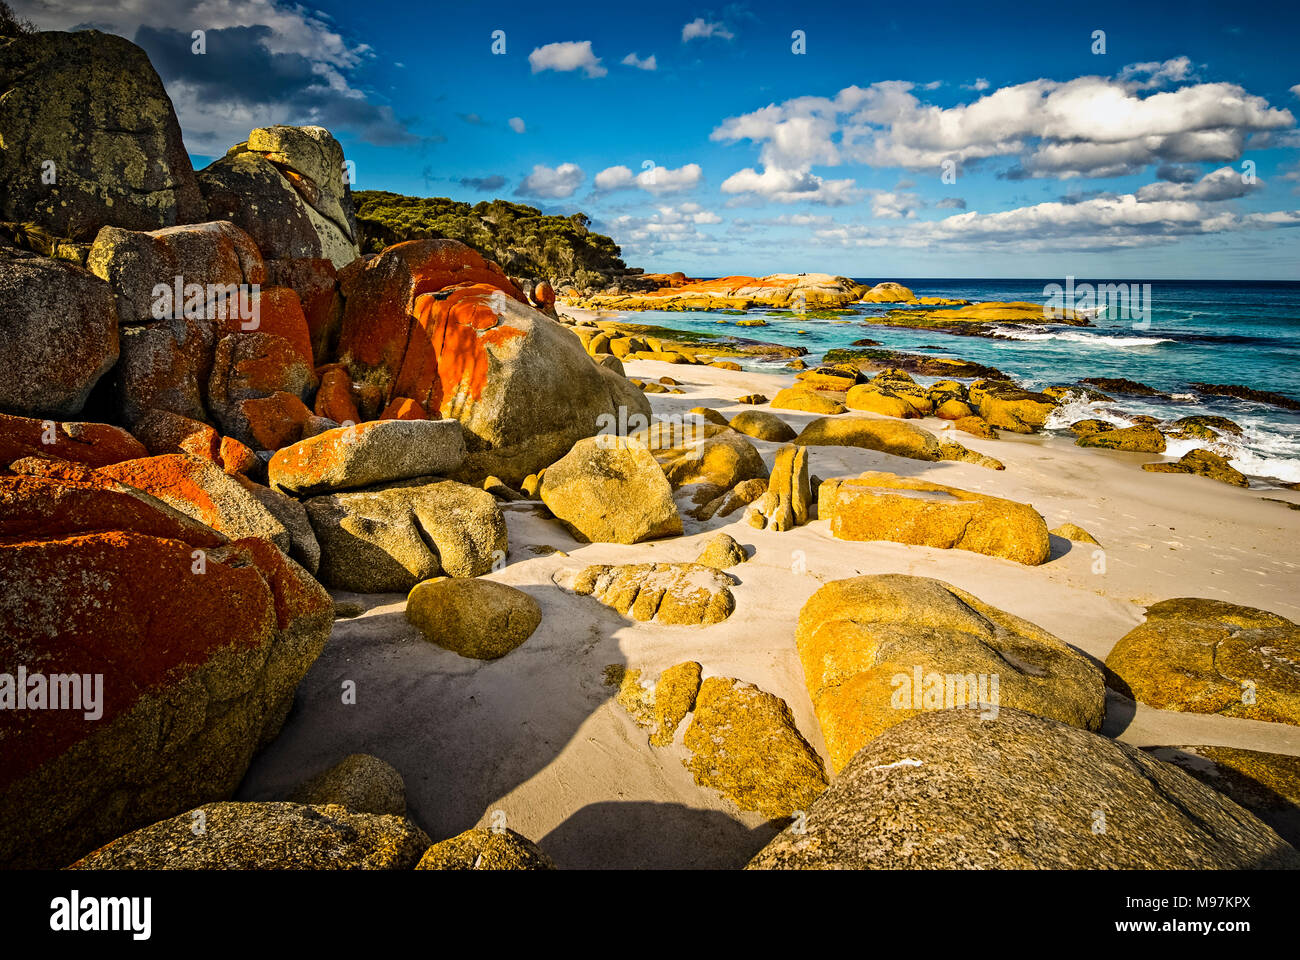 Australien, Tasmanien,  Felsformation, Bay Of Fires, St. Helens, Granitfelsen - Stock Image